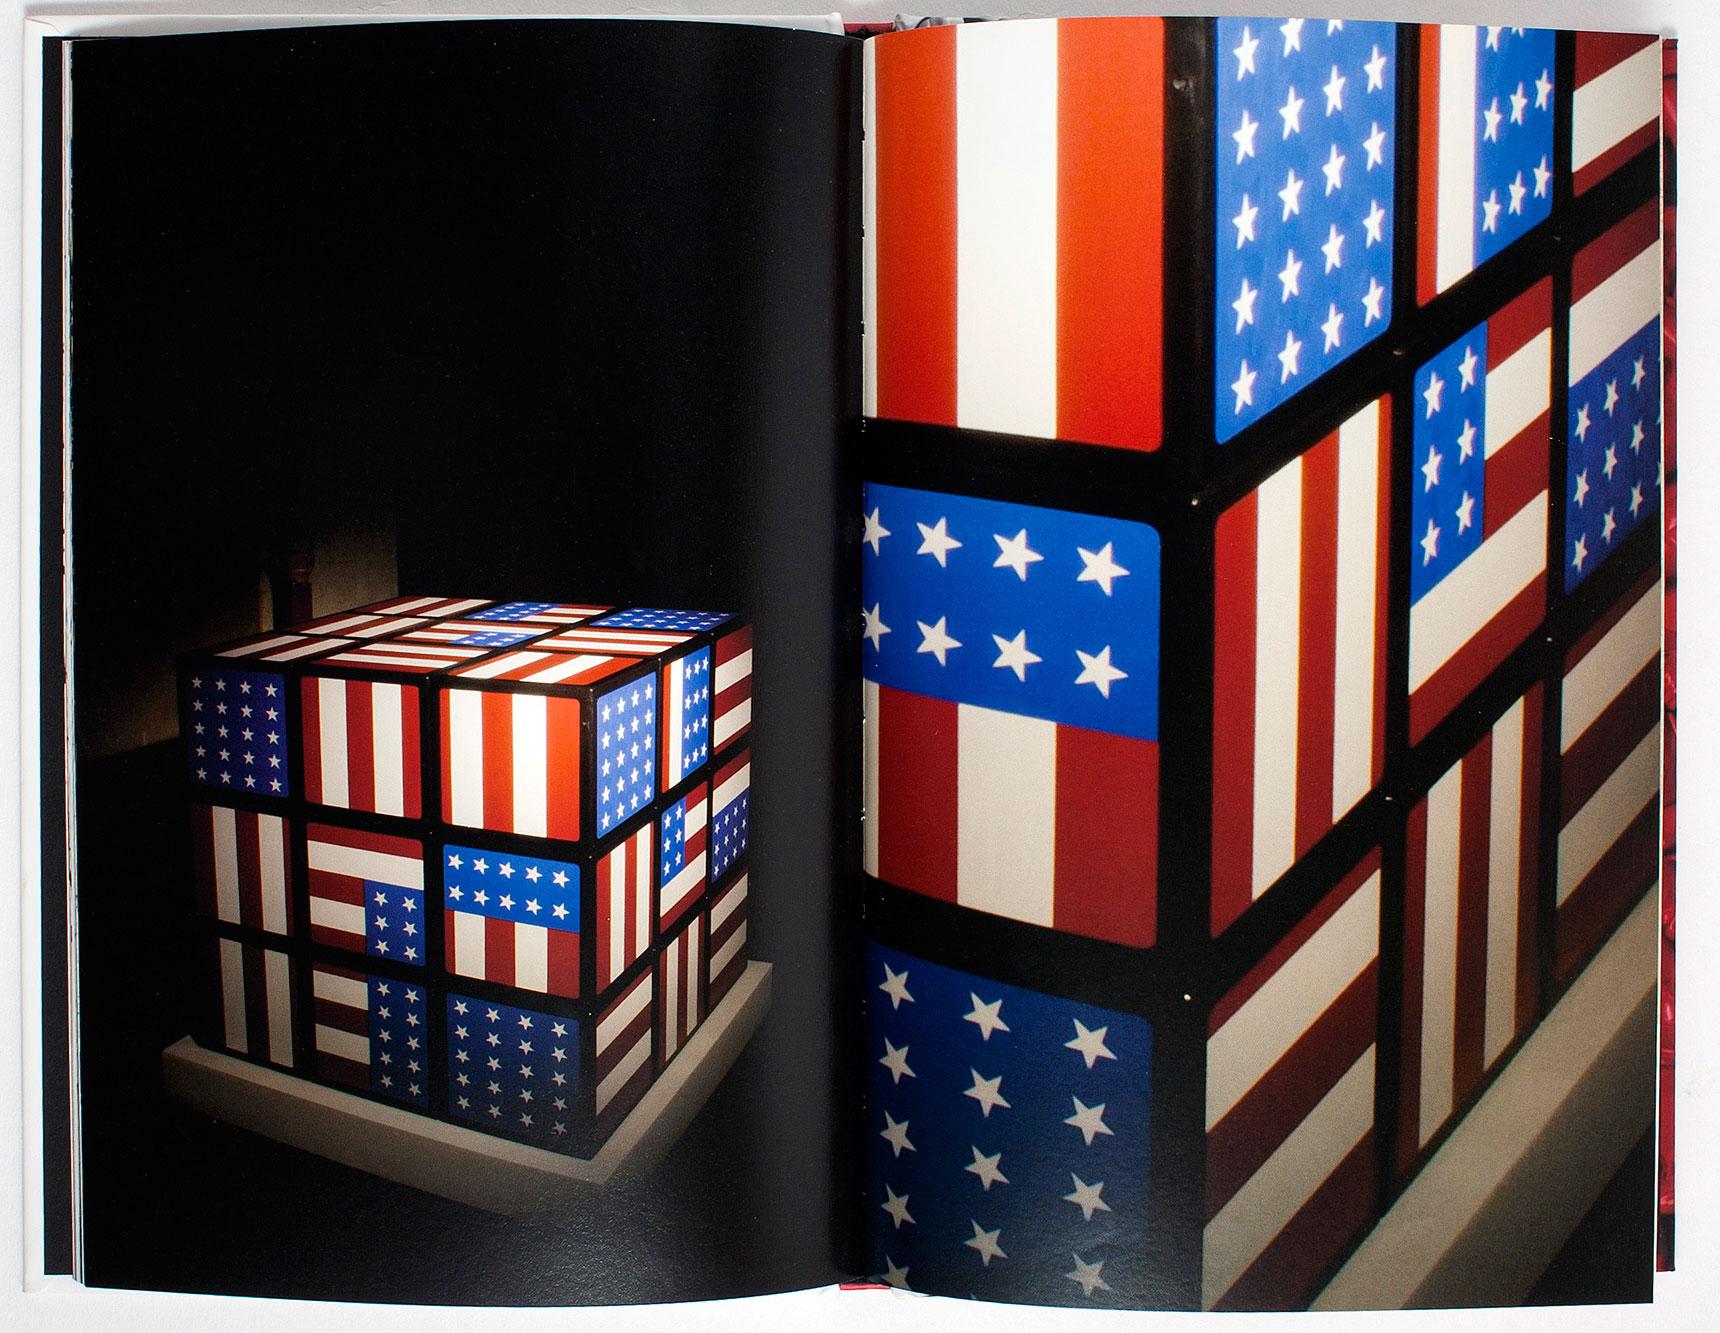 epm-print-management-bristol-ben-turnball-art-books-4.jpg